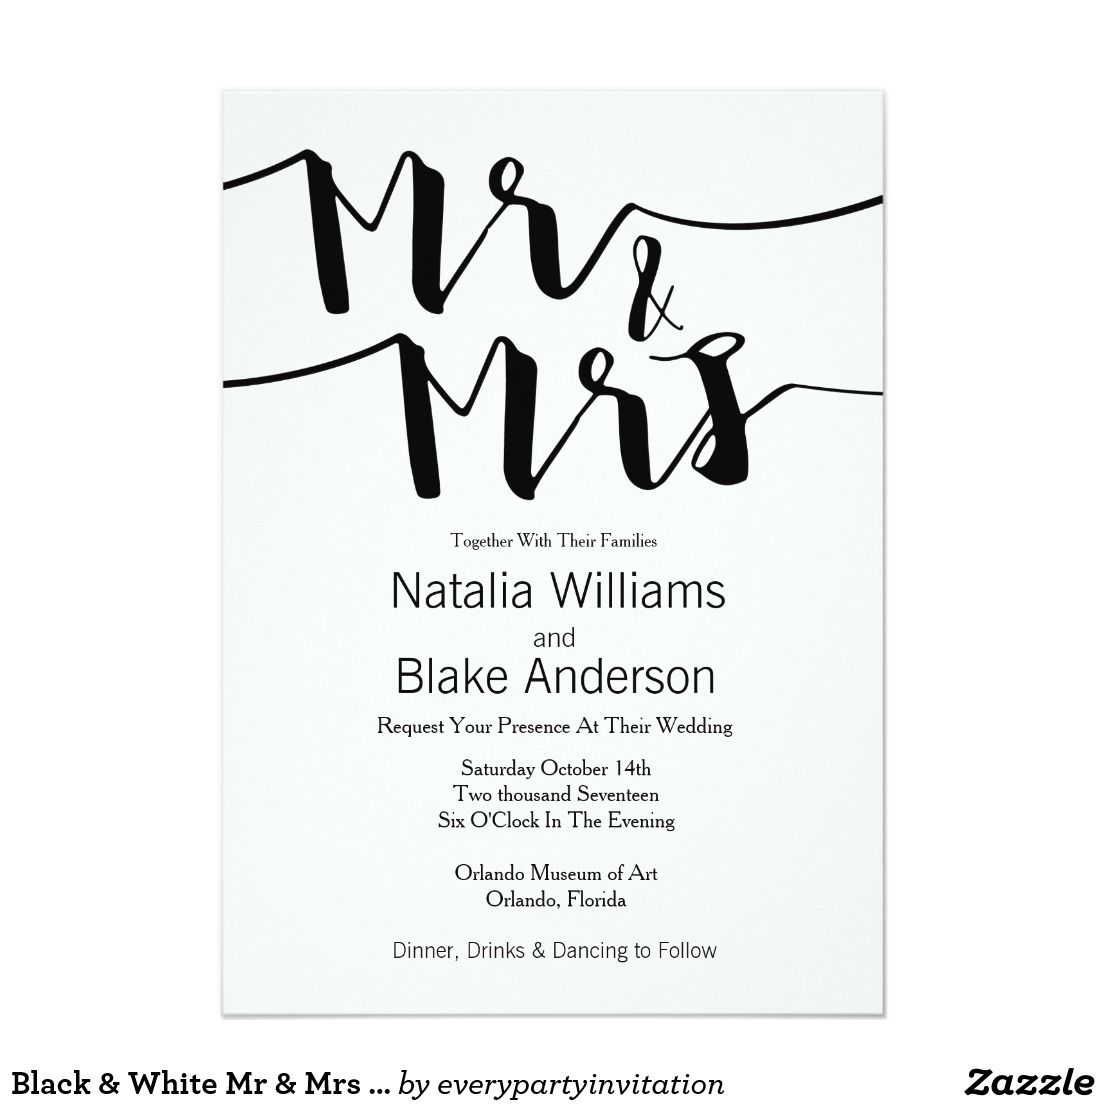 Black & White Mr & Mrs Modern Wedding Invitation | Support small ...